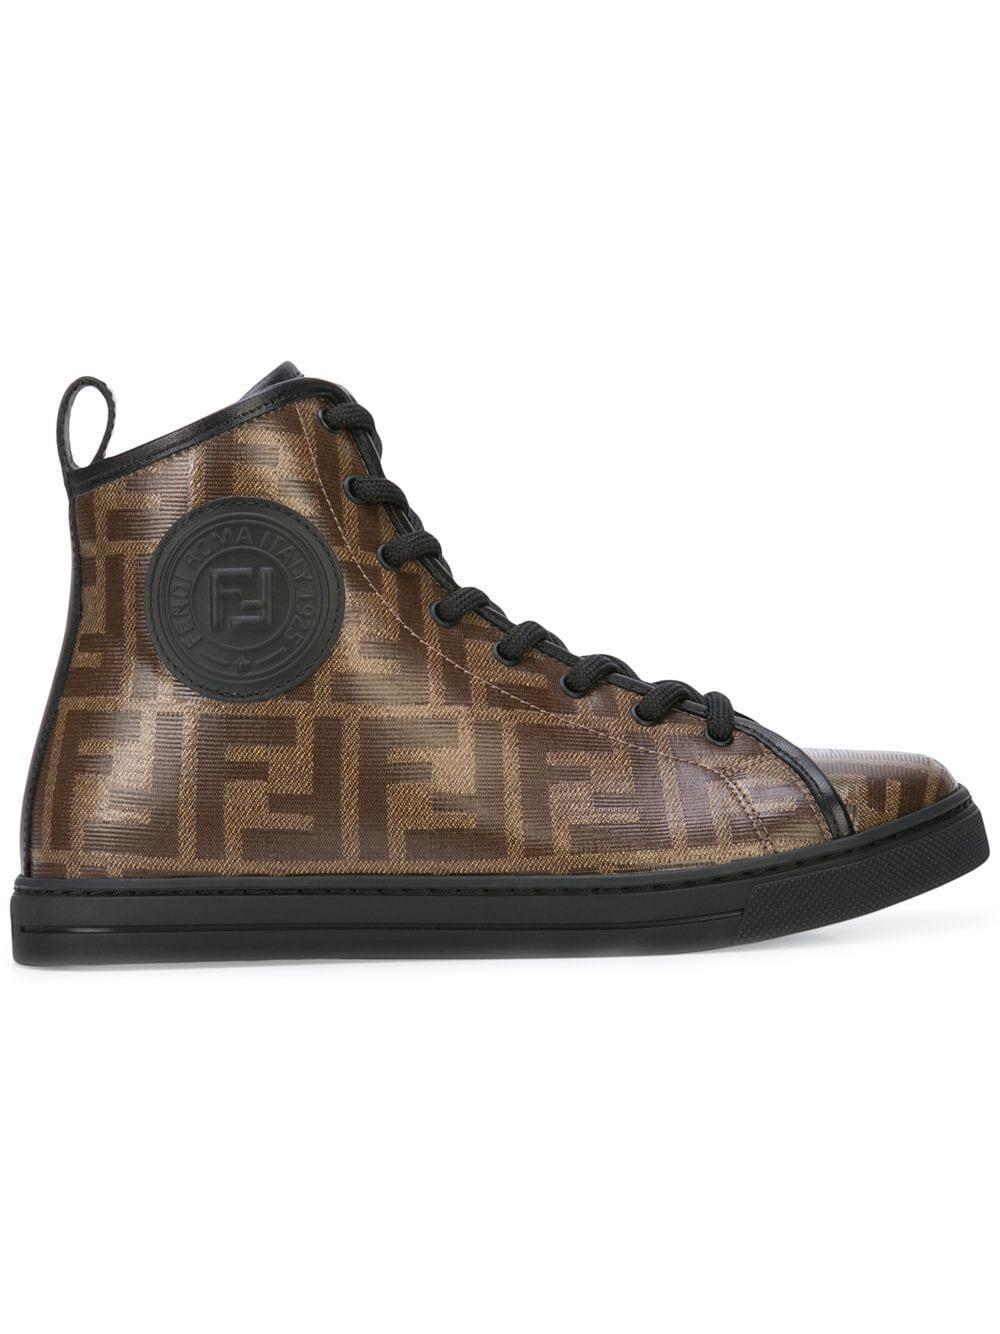 Fendi Rubber Logo High-top Sneakers in